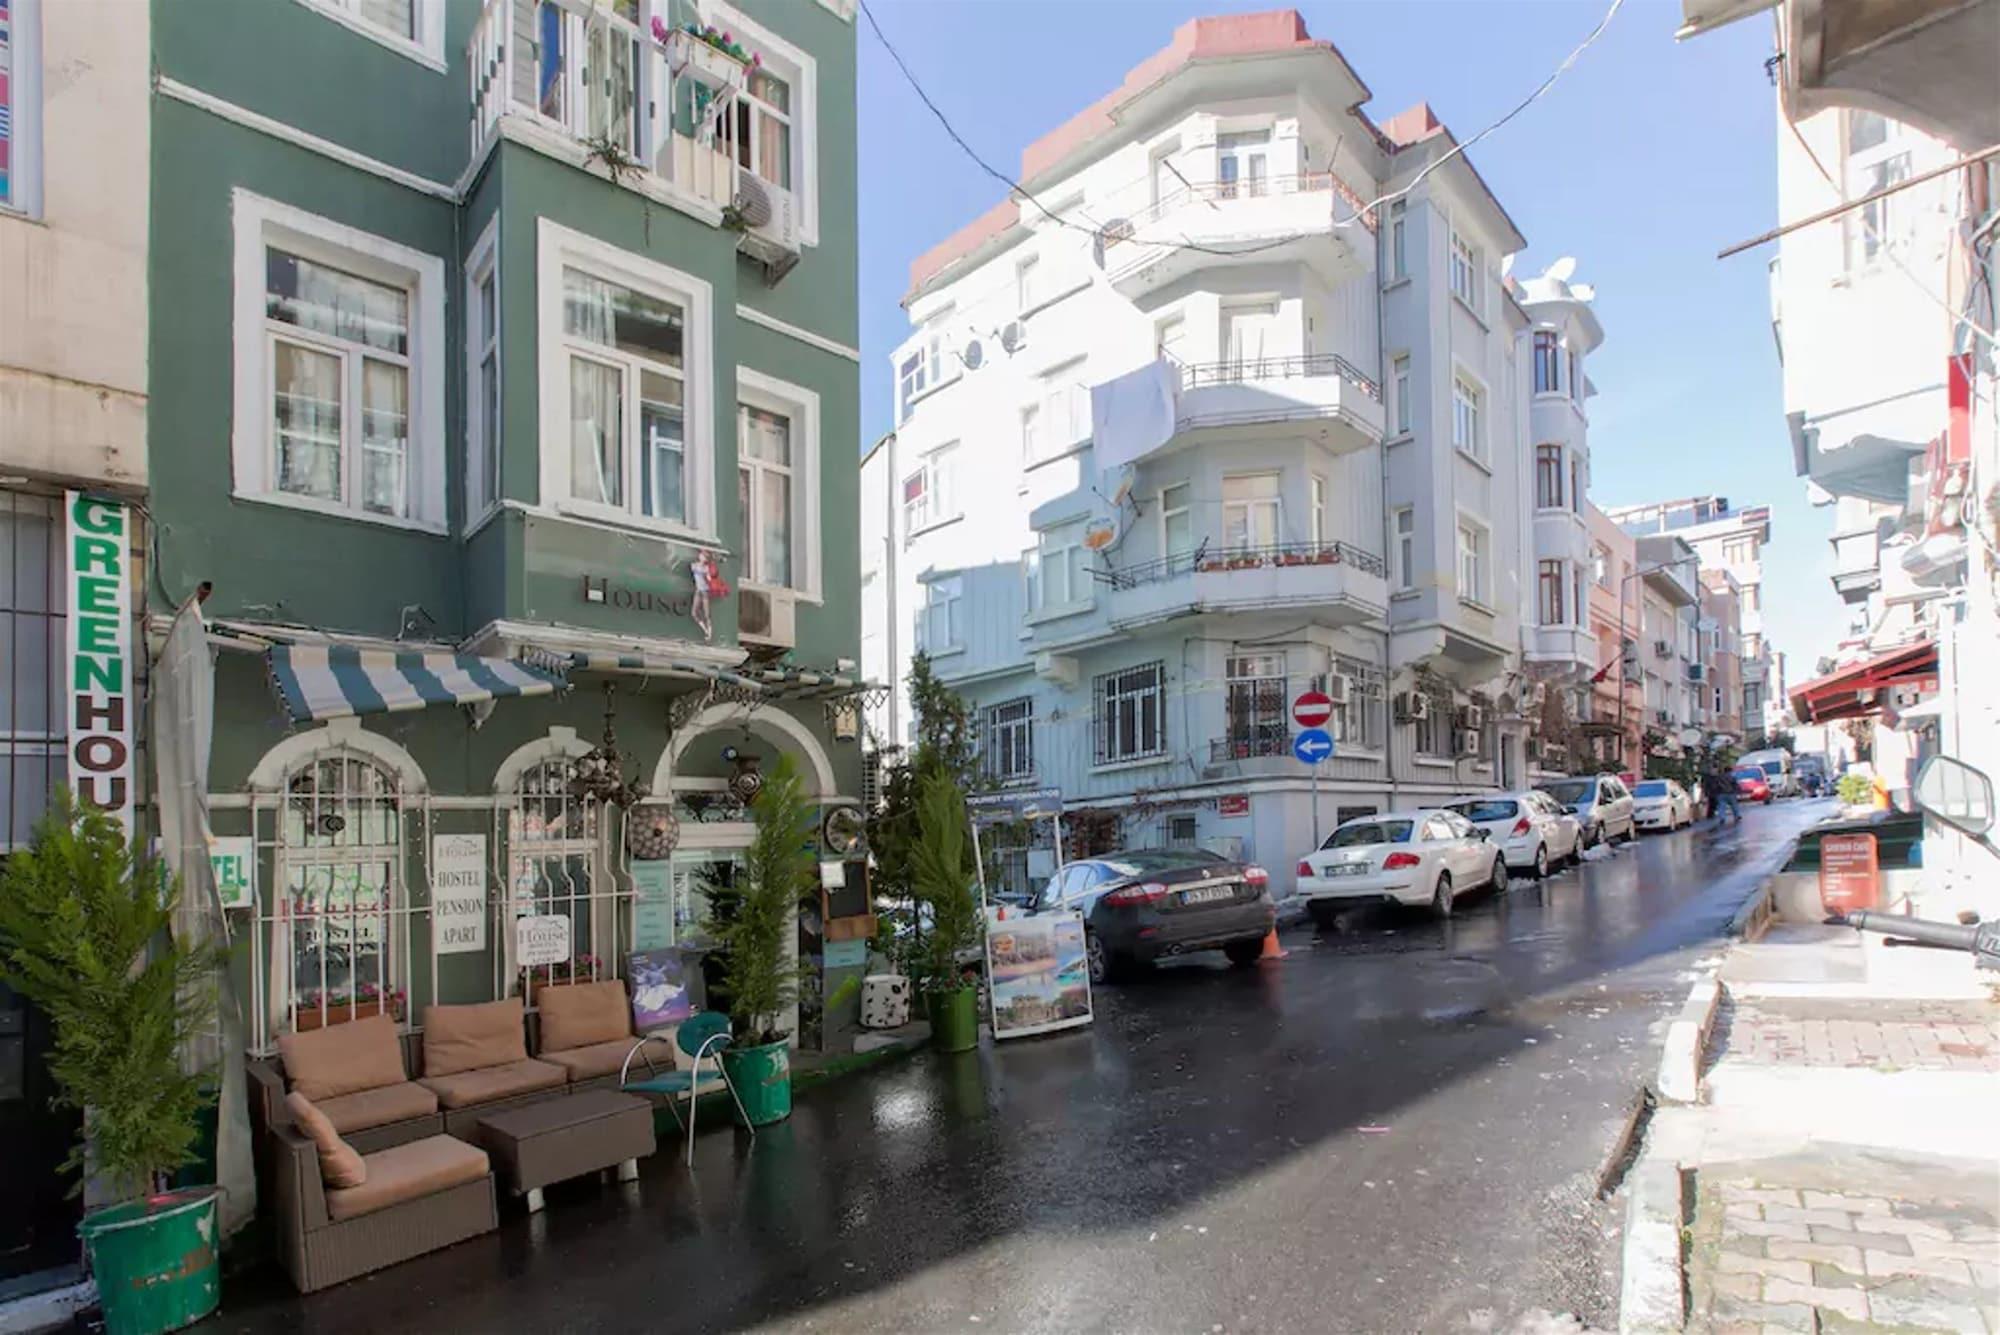 Taksim Green House Hostel, Beyoğlu